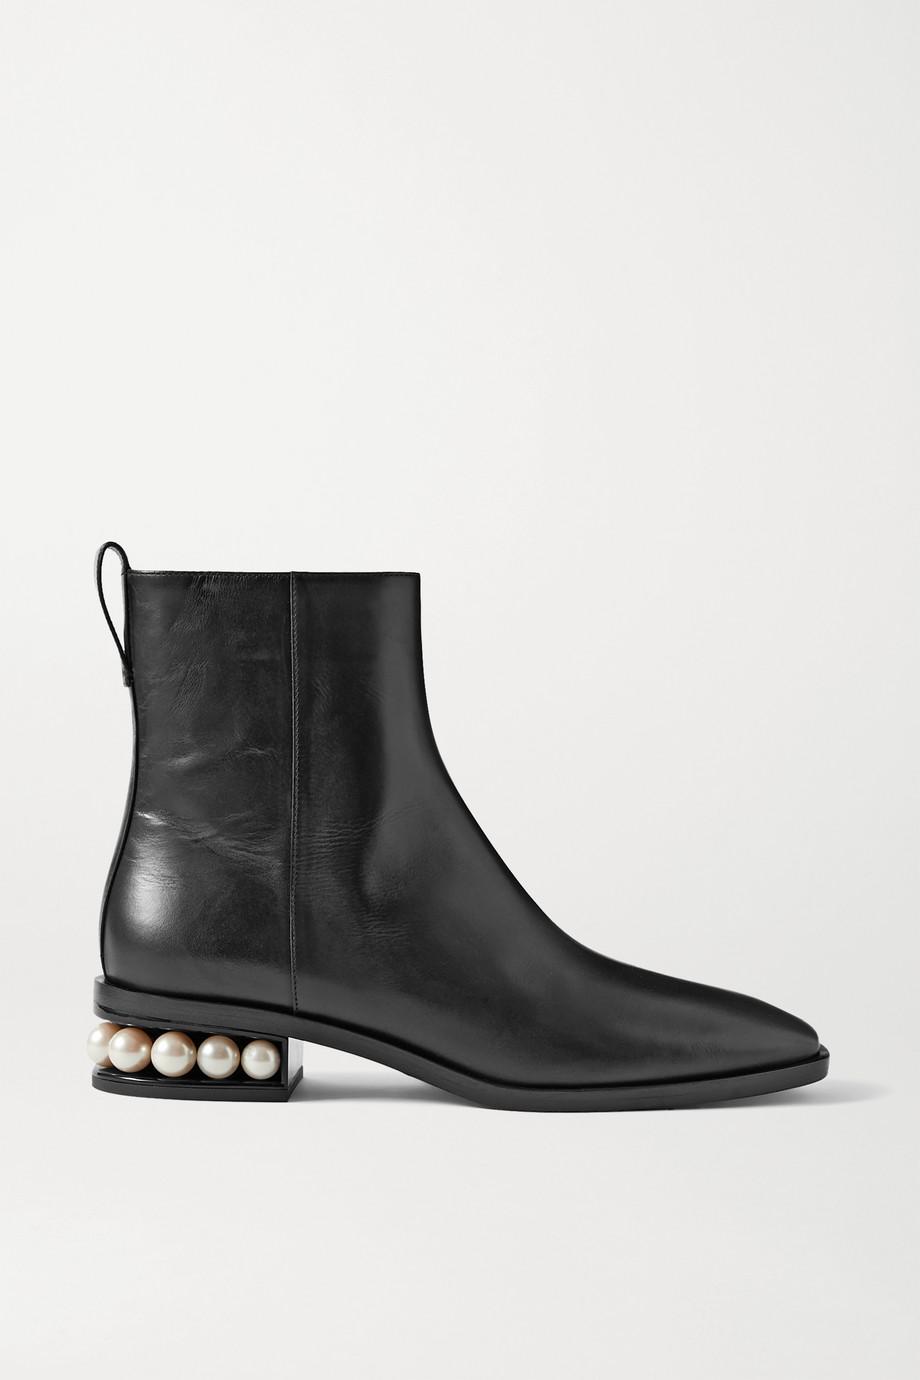 Nicholas Kirkwood Casati 人造珍珠缀饰皮革踝靴